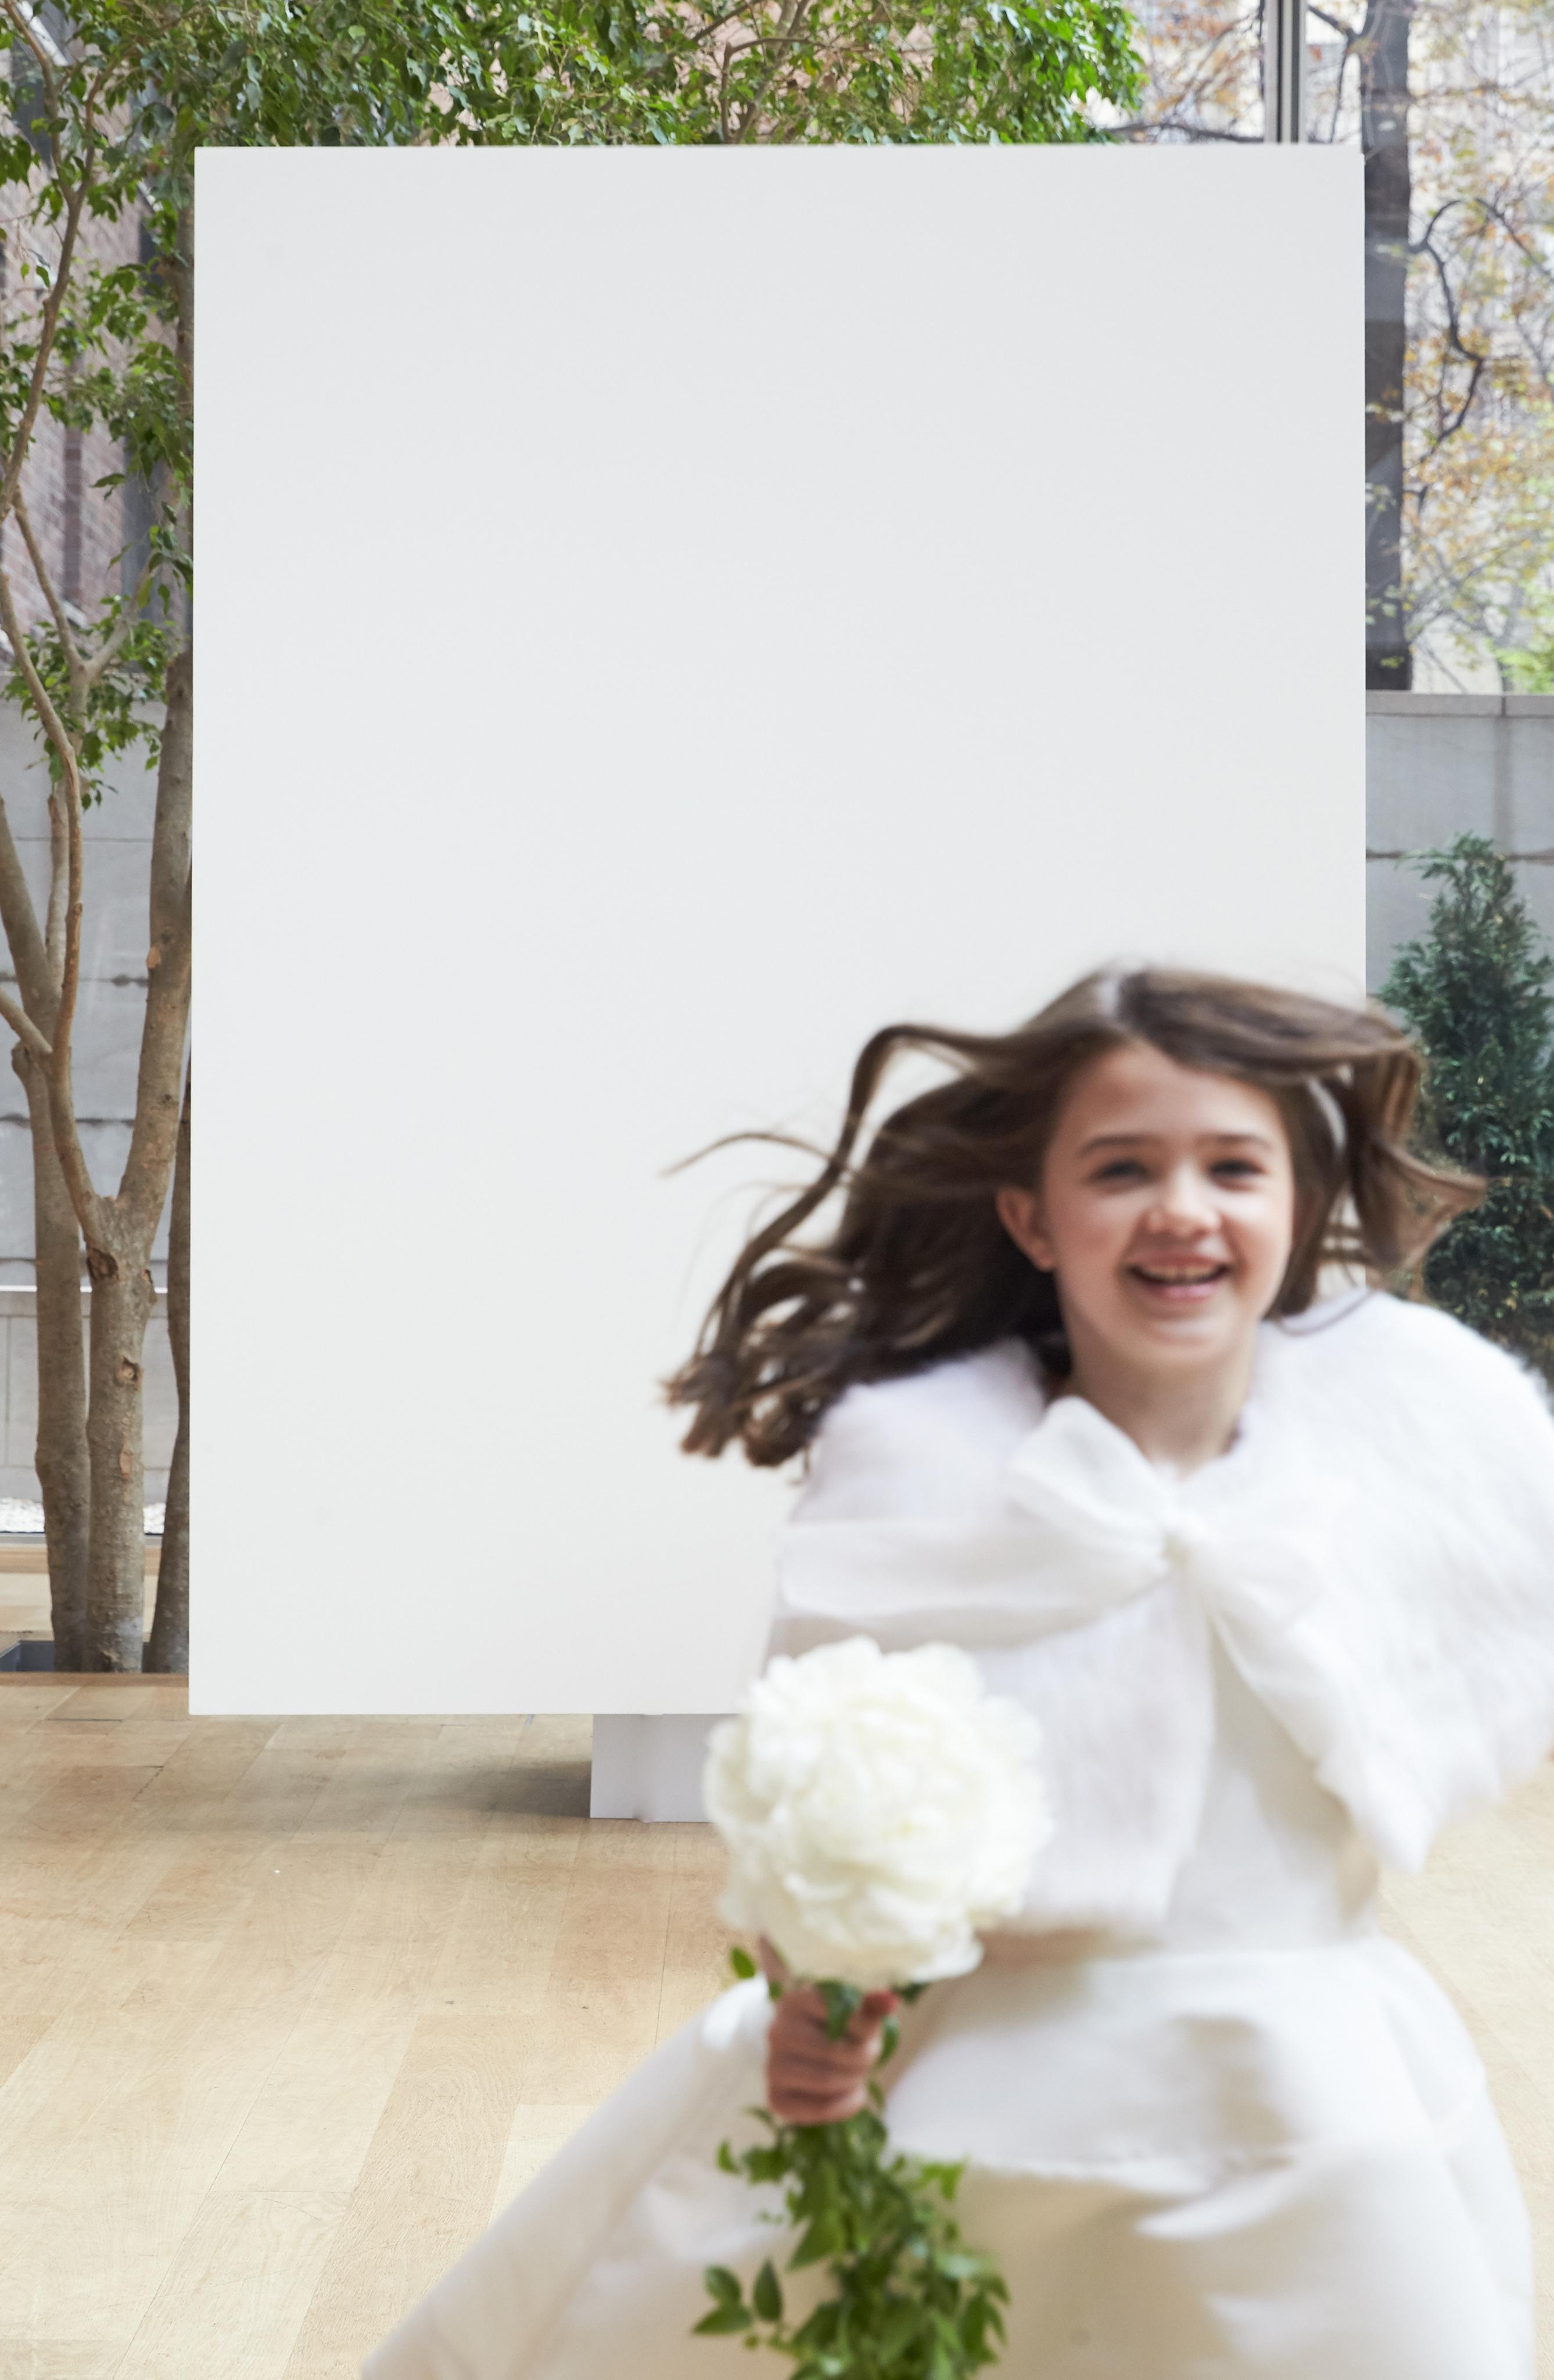 flower girl with shawl Oscar de la Renta Spring 2018 Wedding Dress Collection